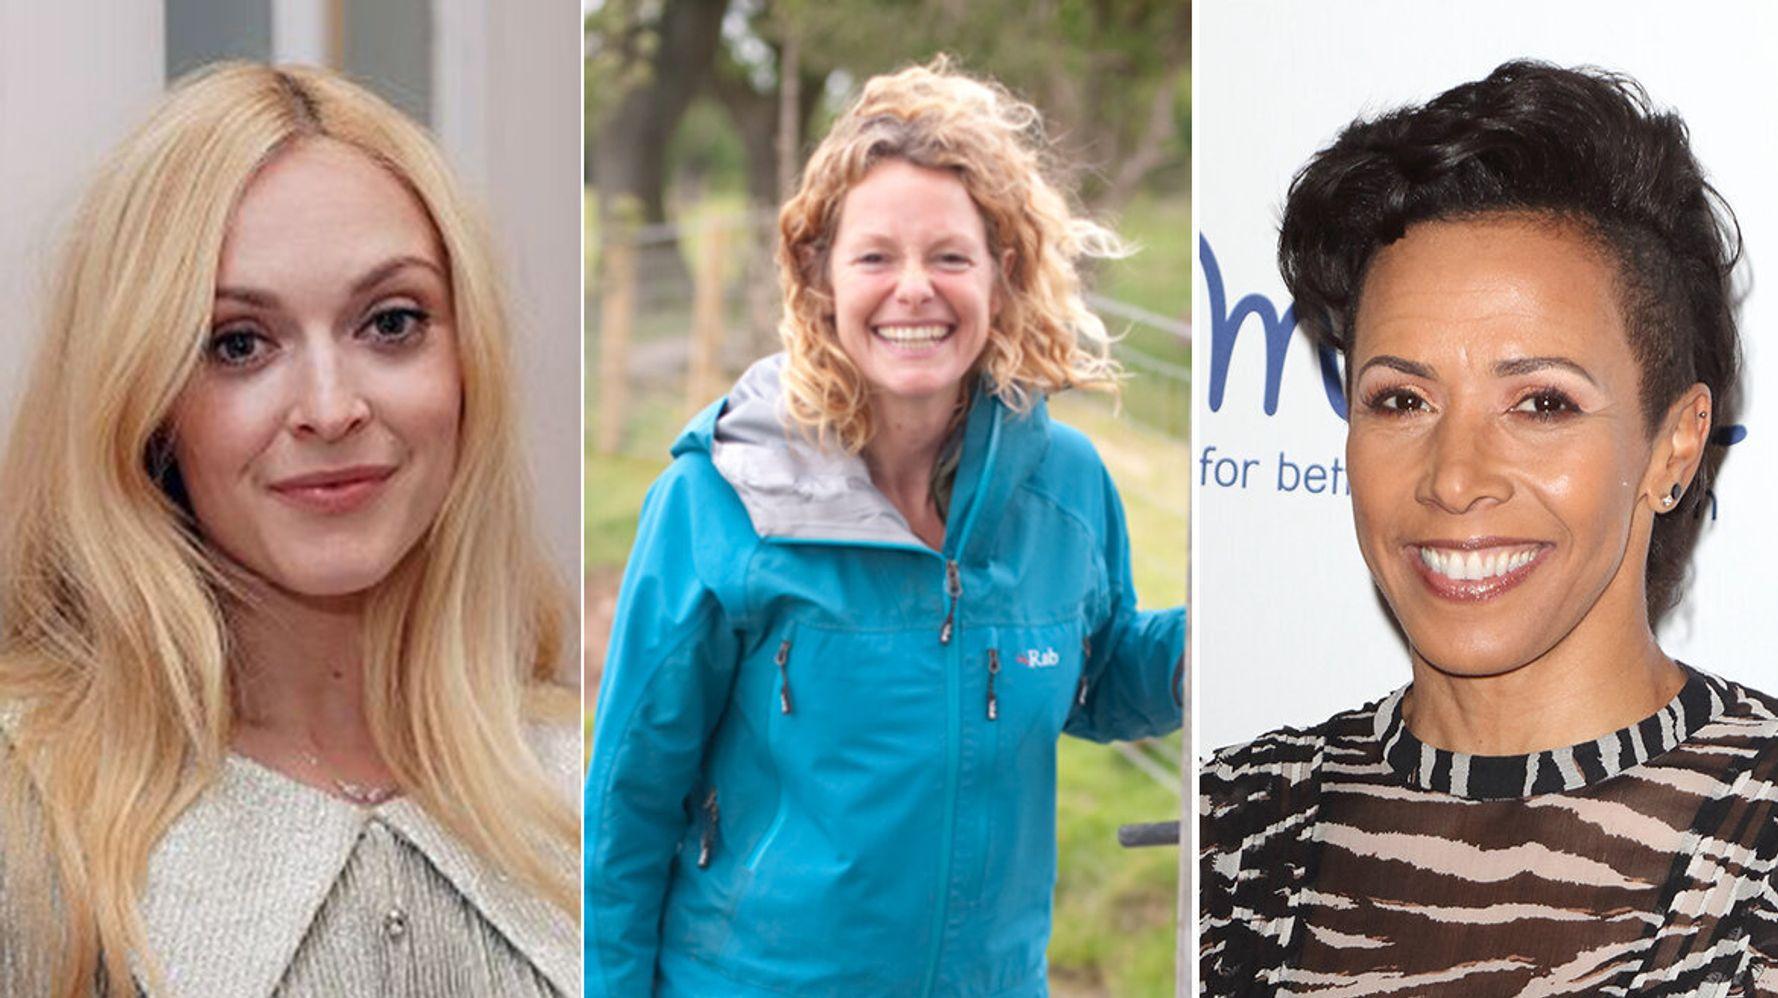 Mental Health Awareness Week: 9 Celebs Share Their Self-Care Strategies